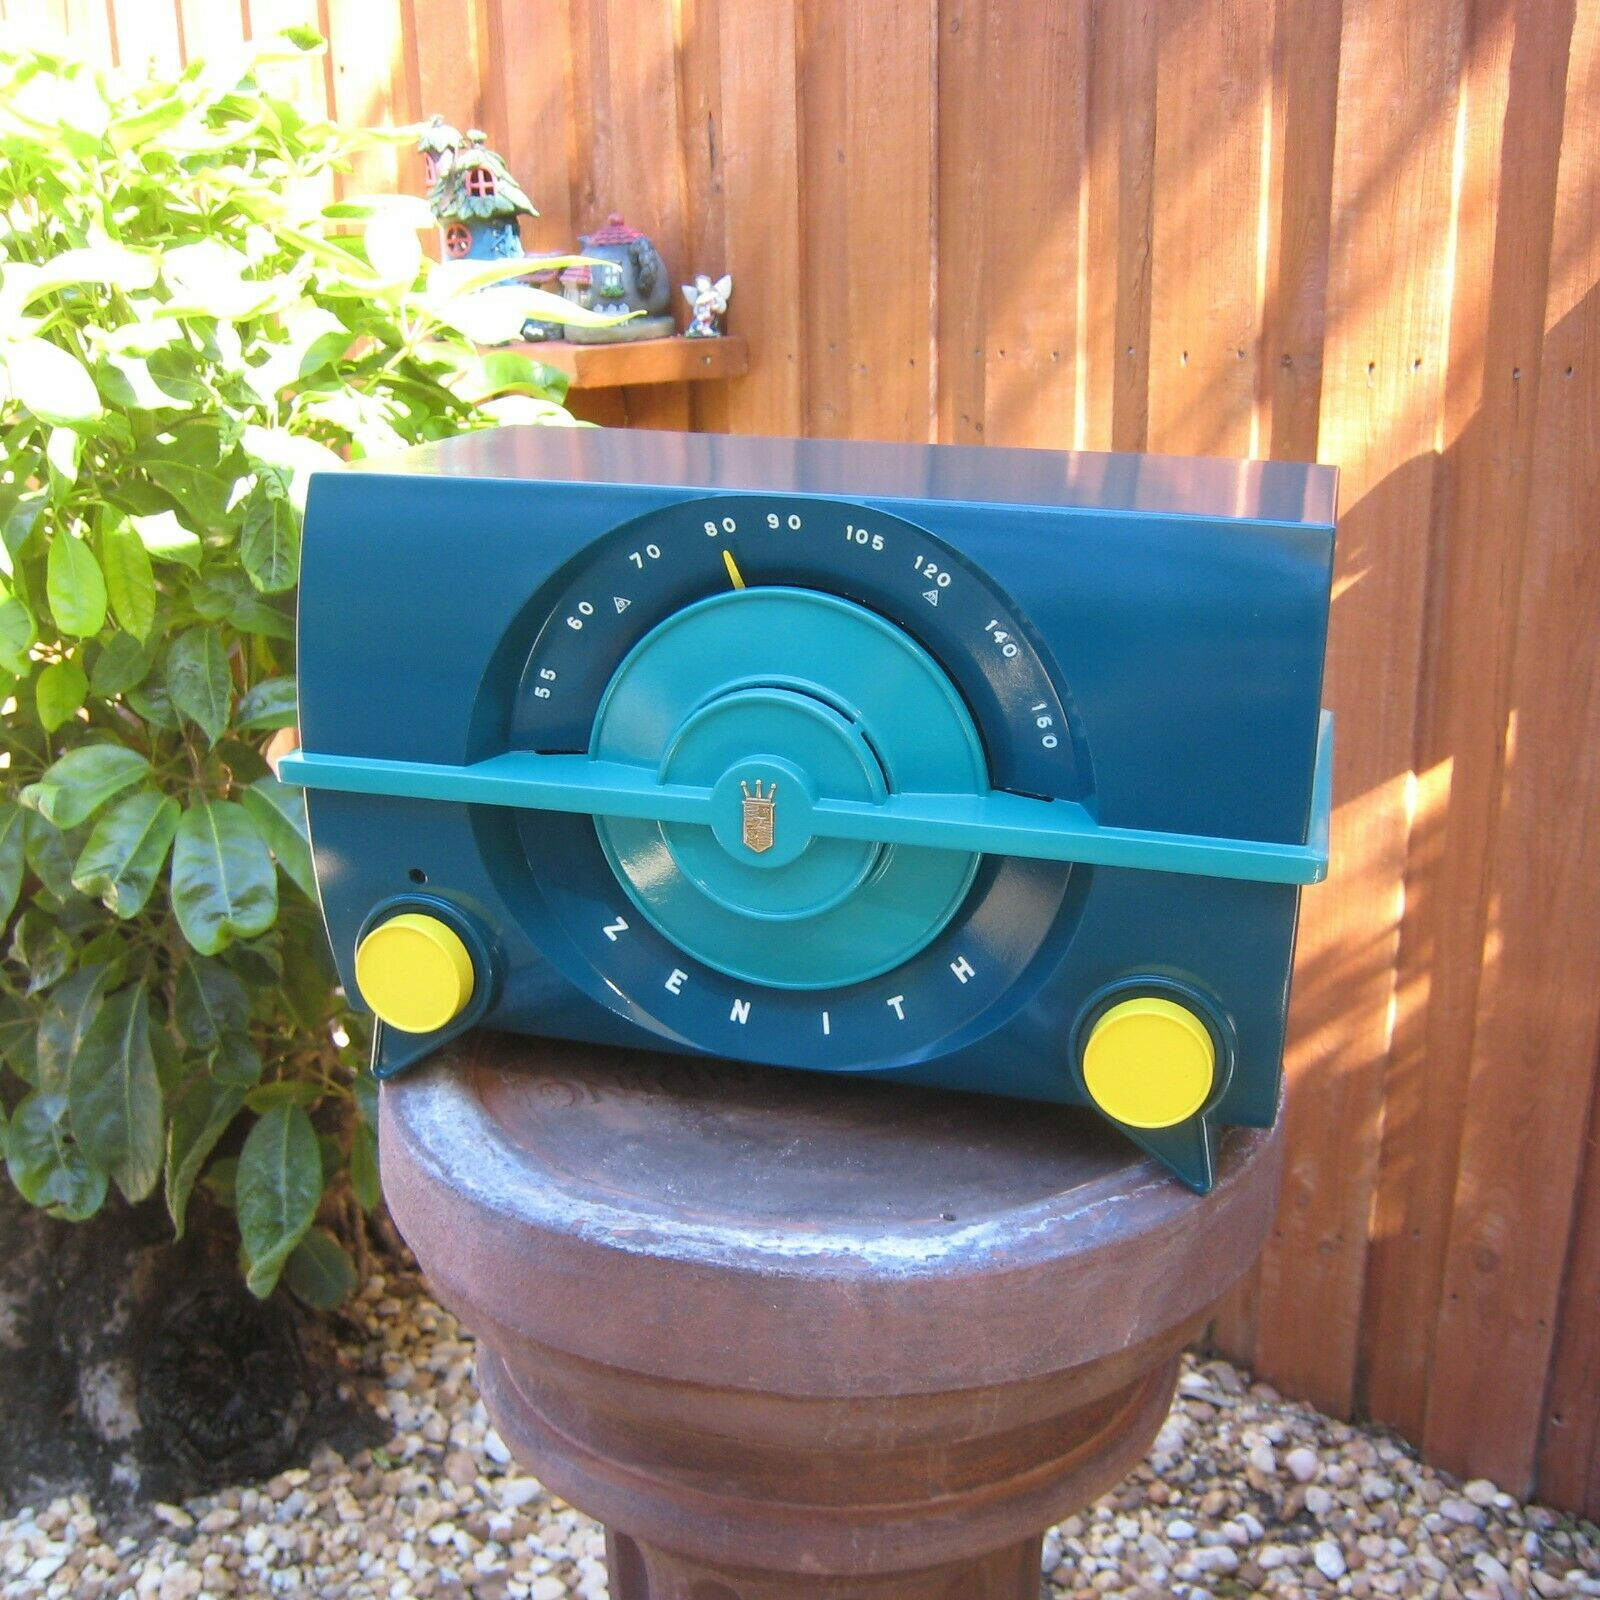 VTG 1952 Zenith J615 AM Tube Radio Painted Bakelite Mid Century Atomic - $49.99